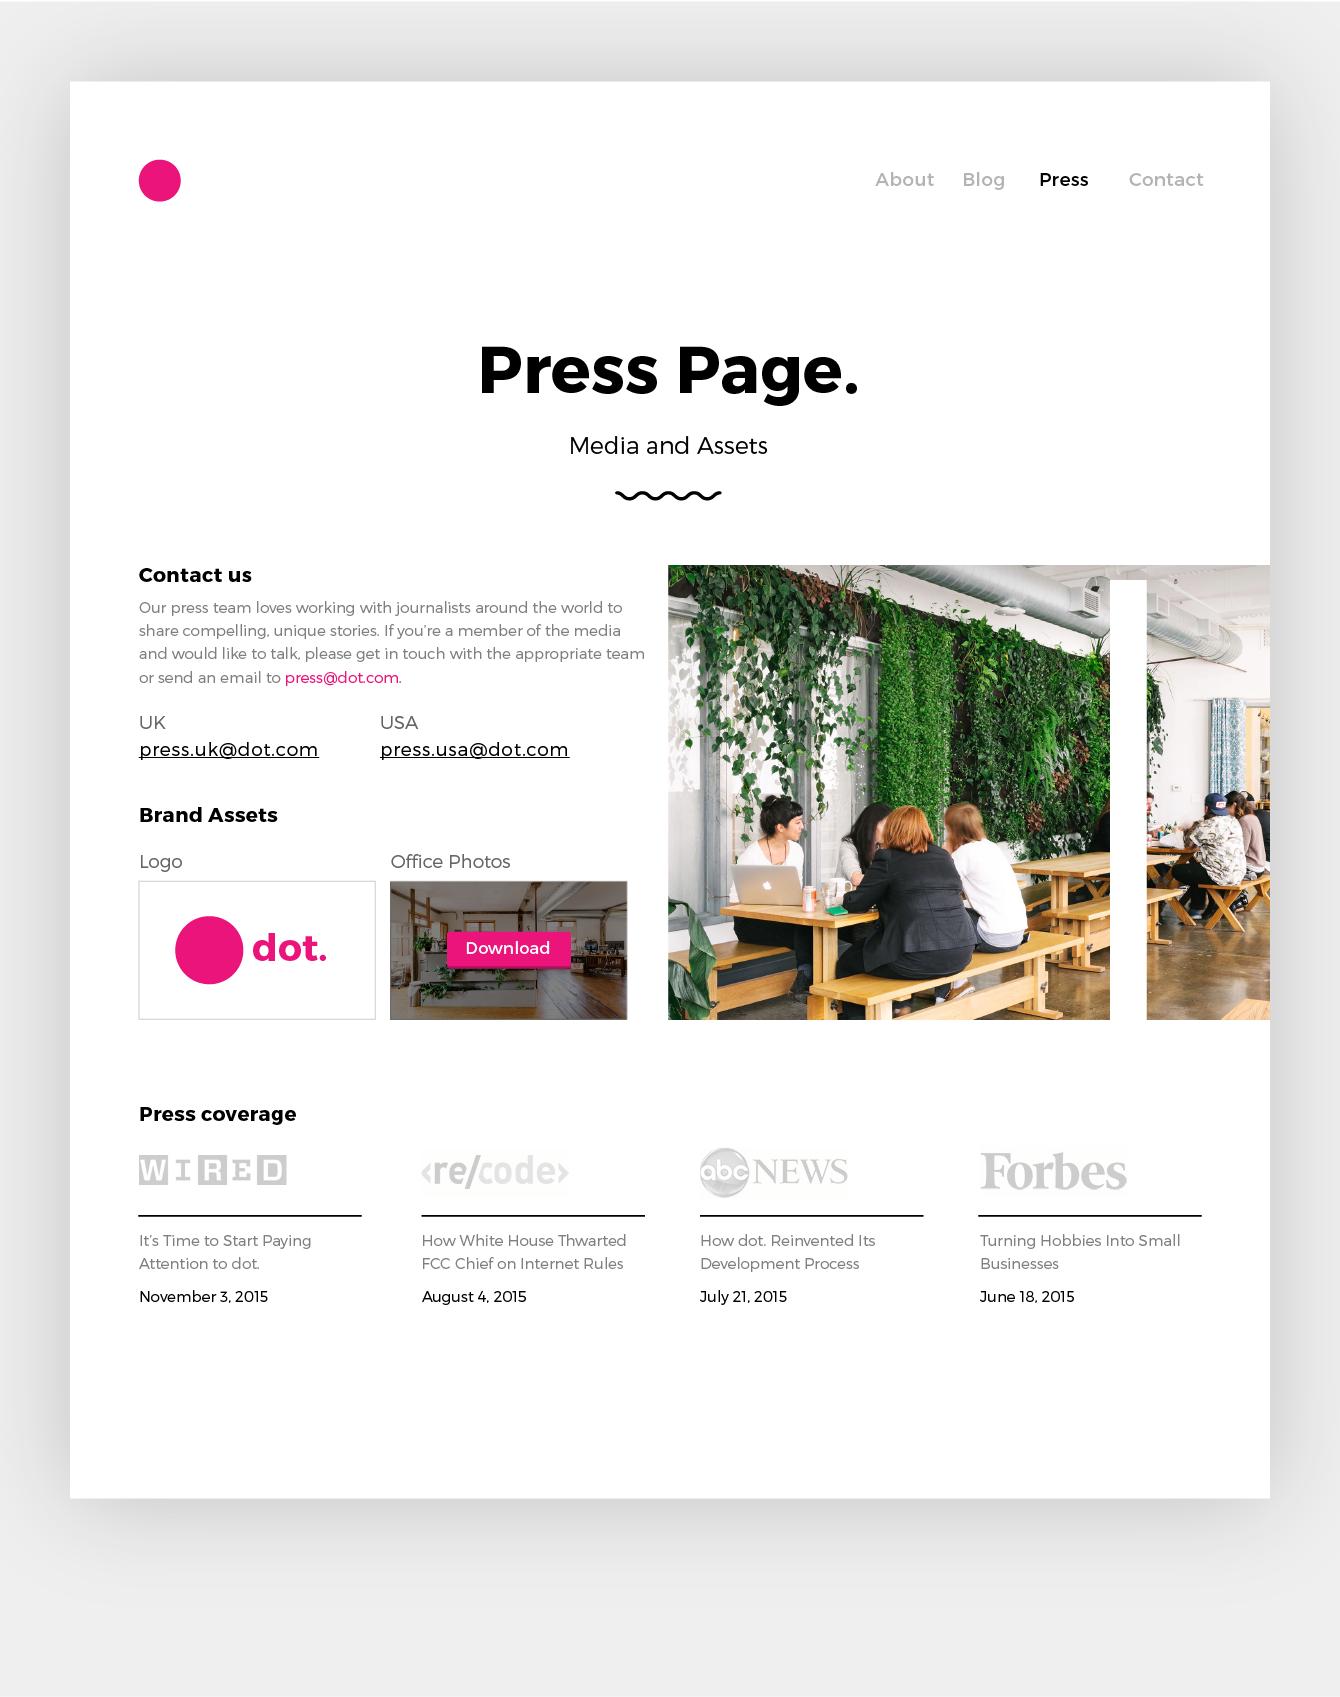 51 Press Page 01 Png By Irene Georgiou Design Inpiration Web Design Inspiration Pressing